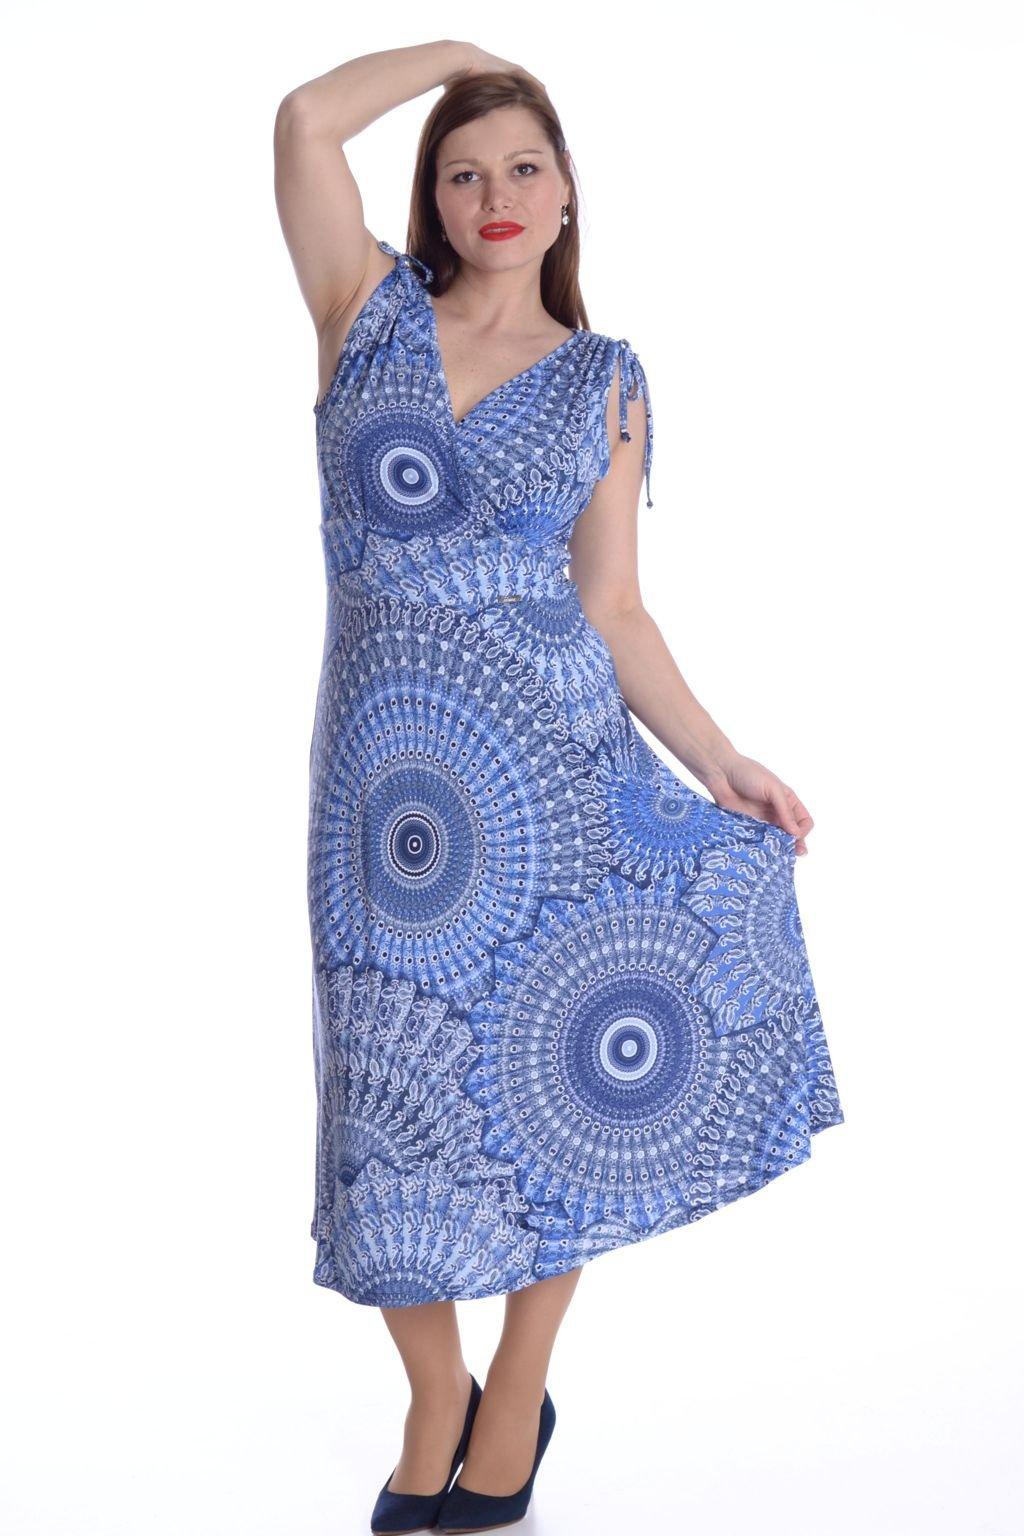 4621 Šaty Venus mandaly modré 33 (2)